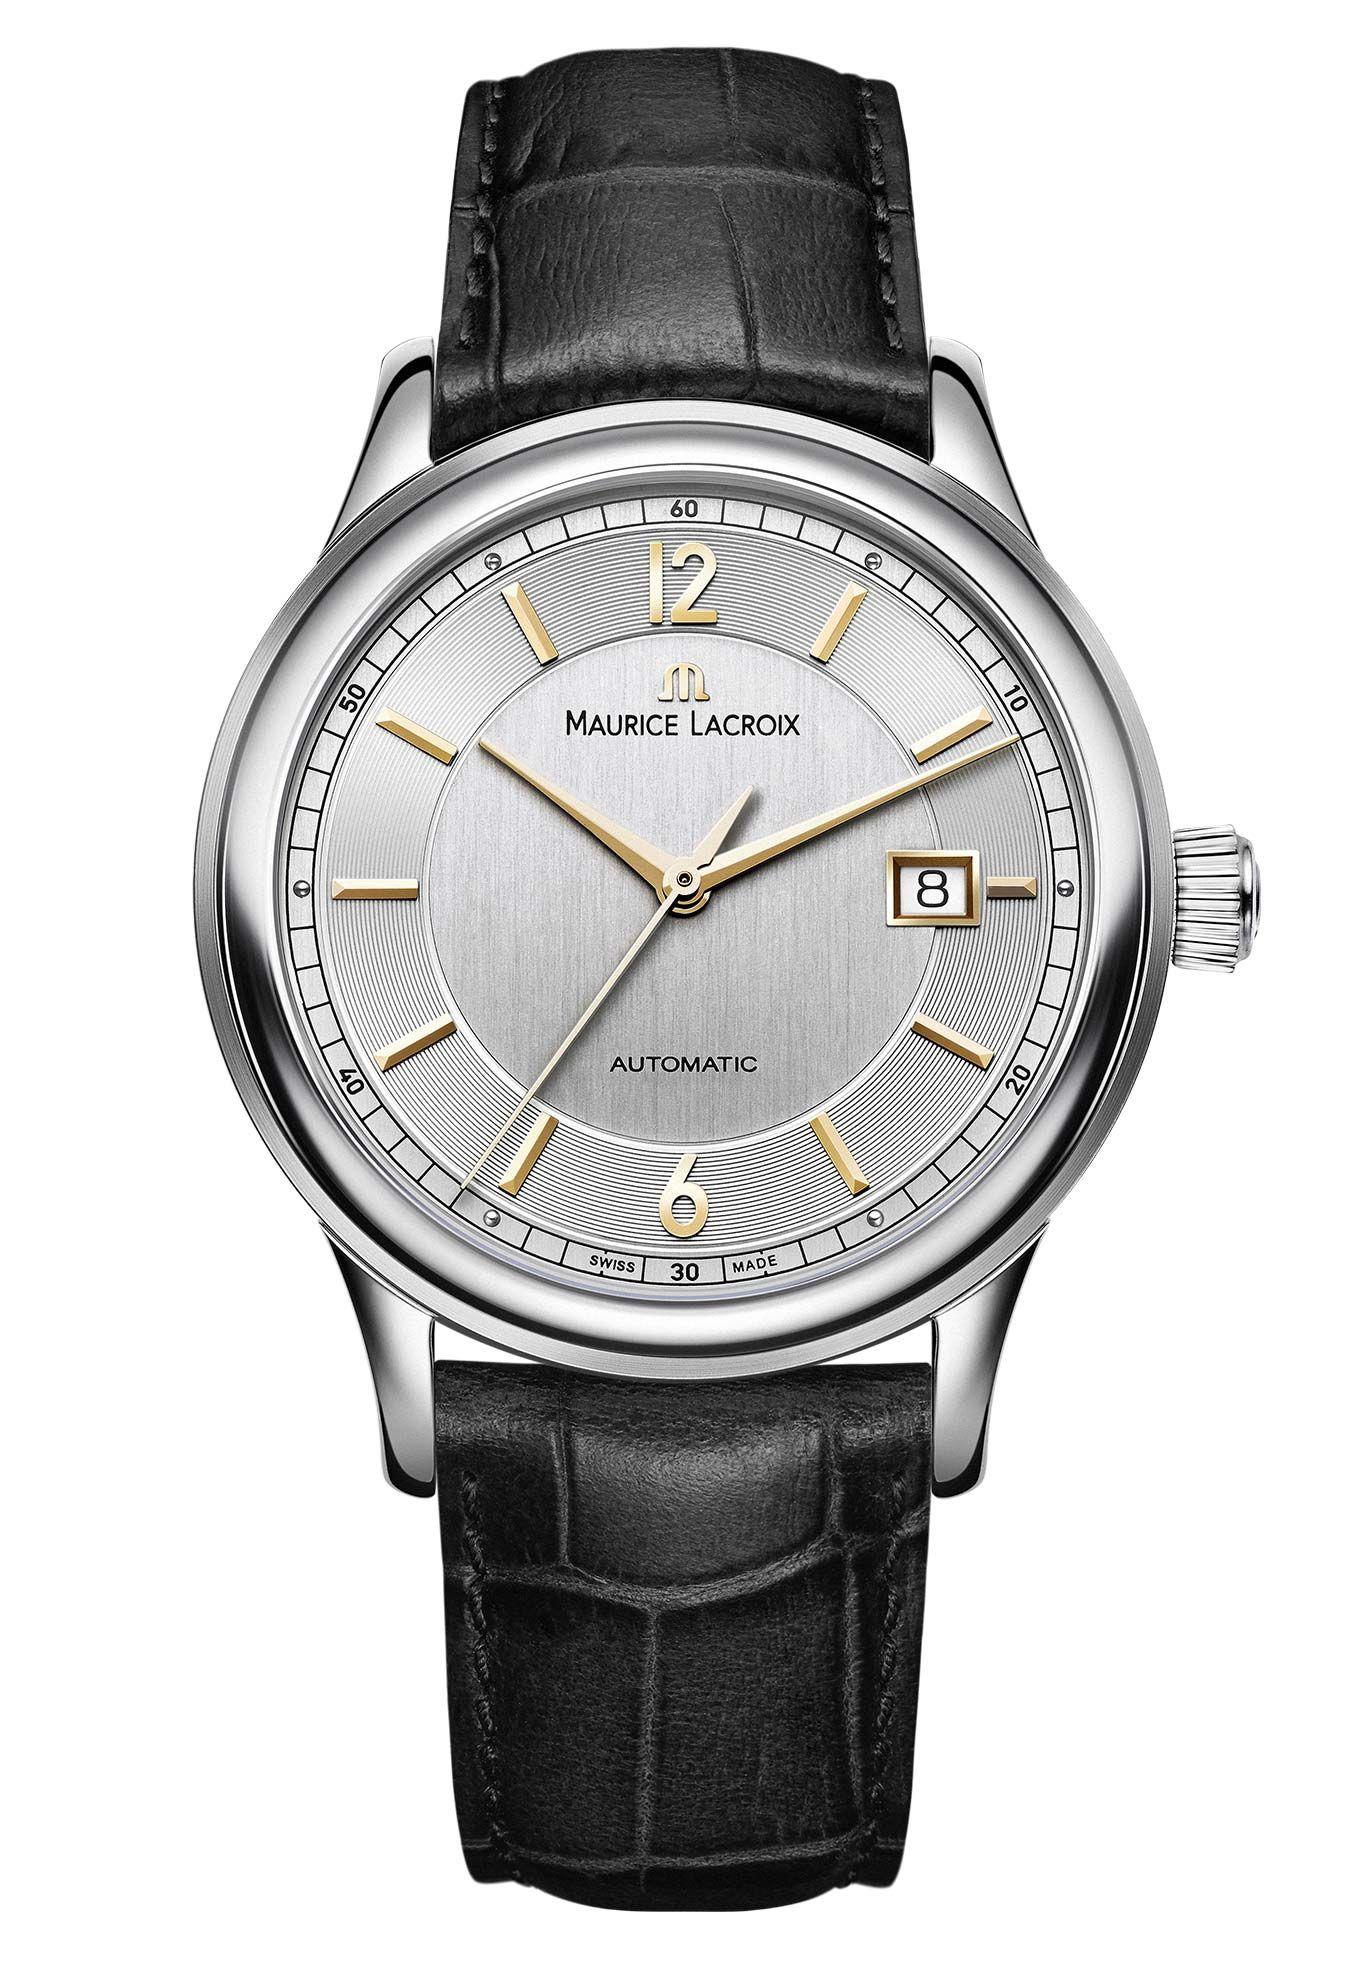 e57df4b32a0b Reloj Cro Maurice Lacroix Les Classiques Date Automático LC6098-SS001-121-1